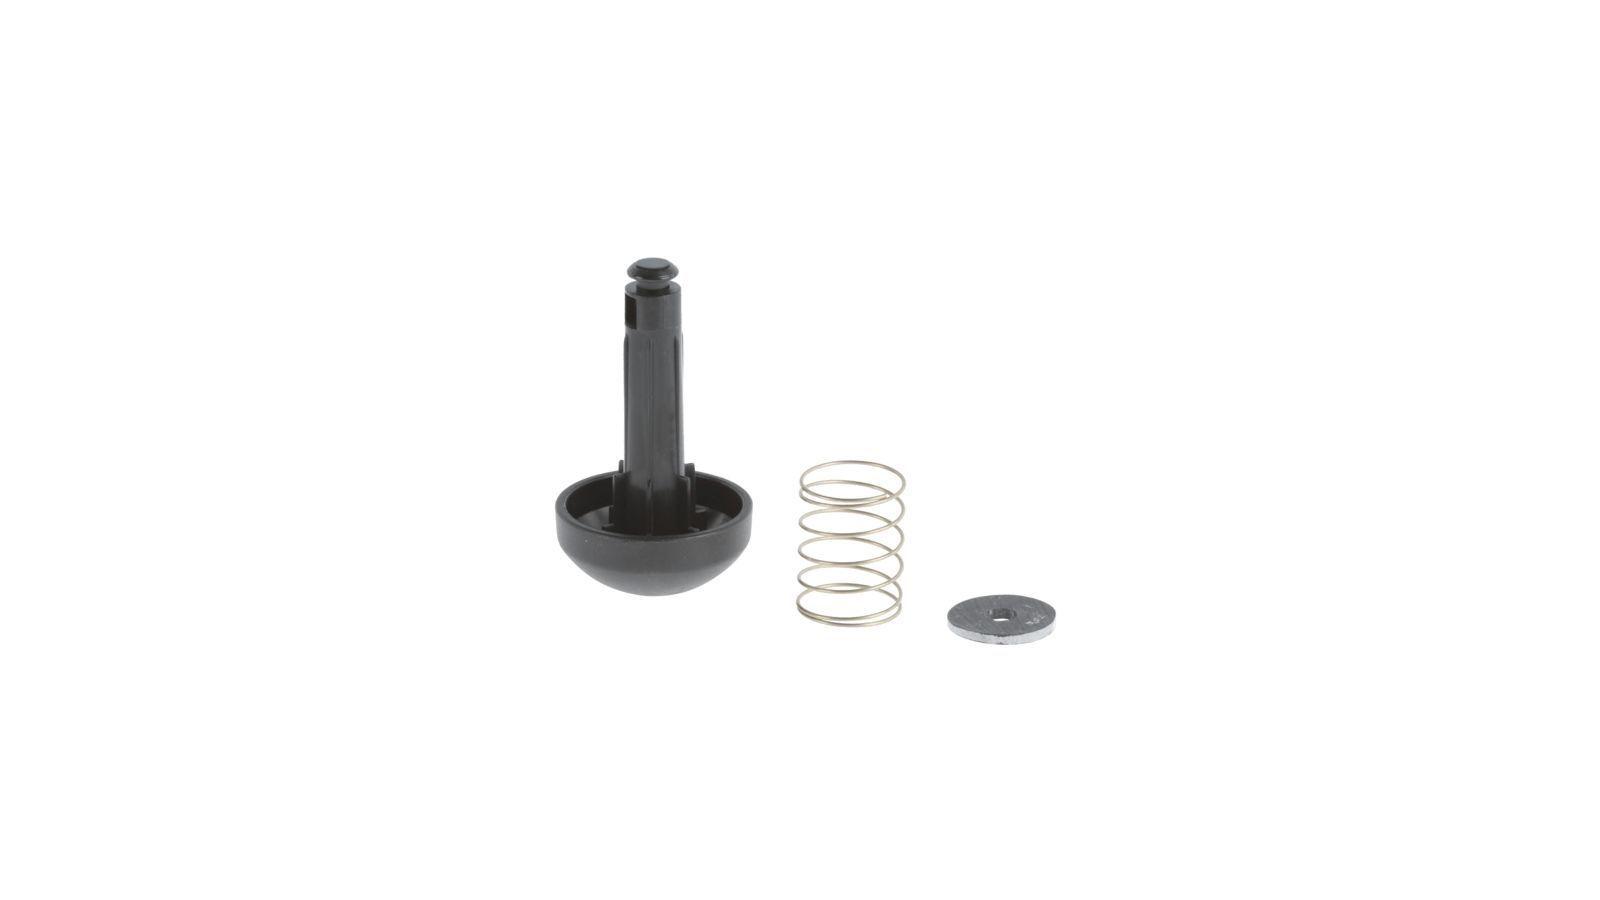 Sealing Kit for Bosch Siemens Coffee Makers - 00425840 BSH